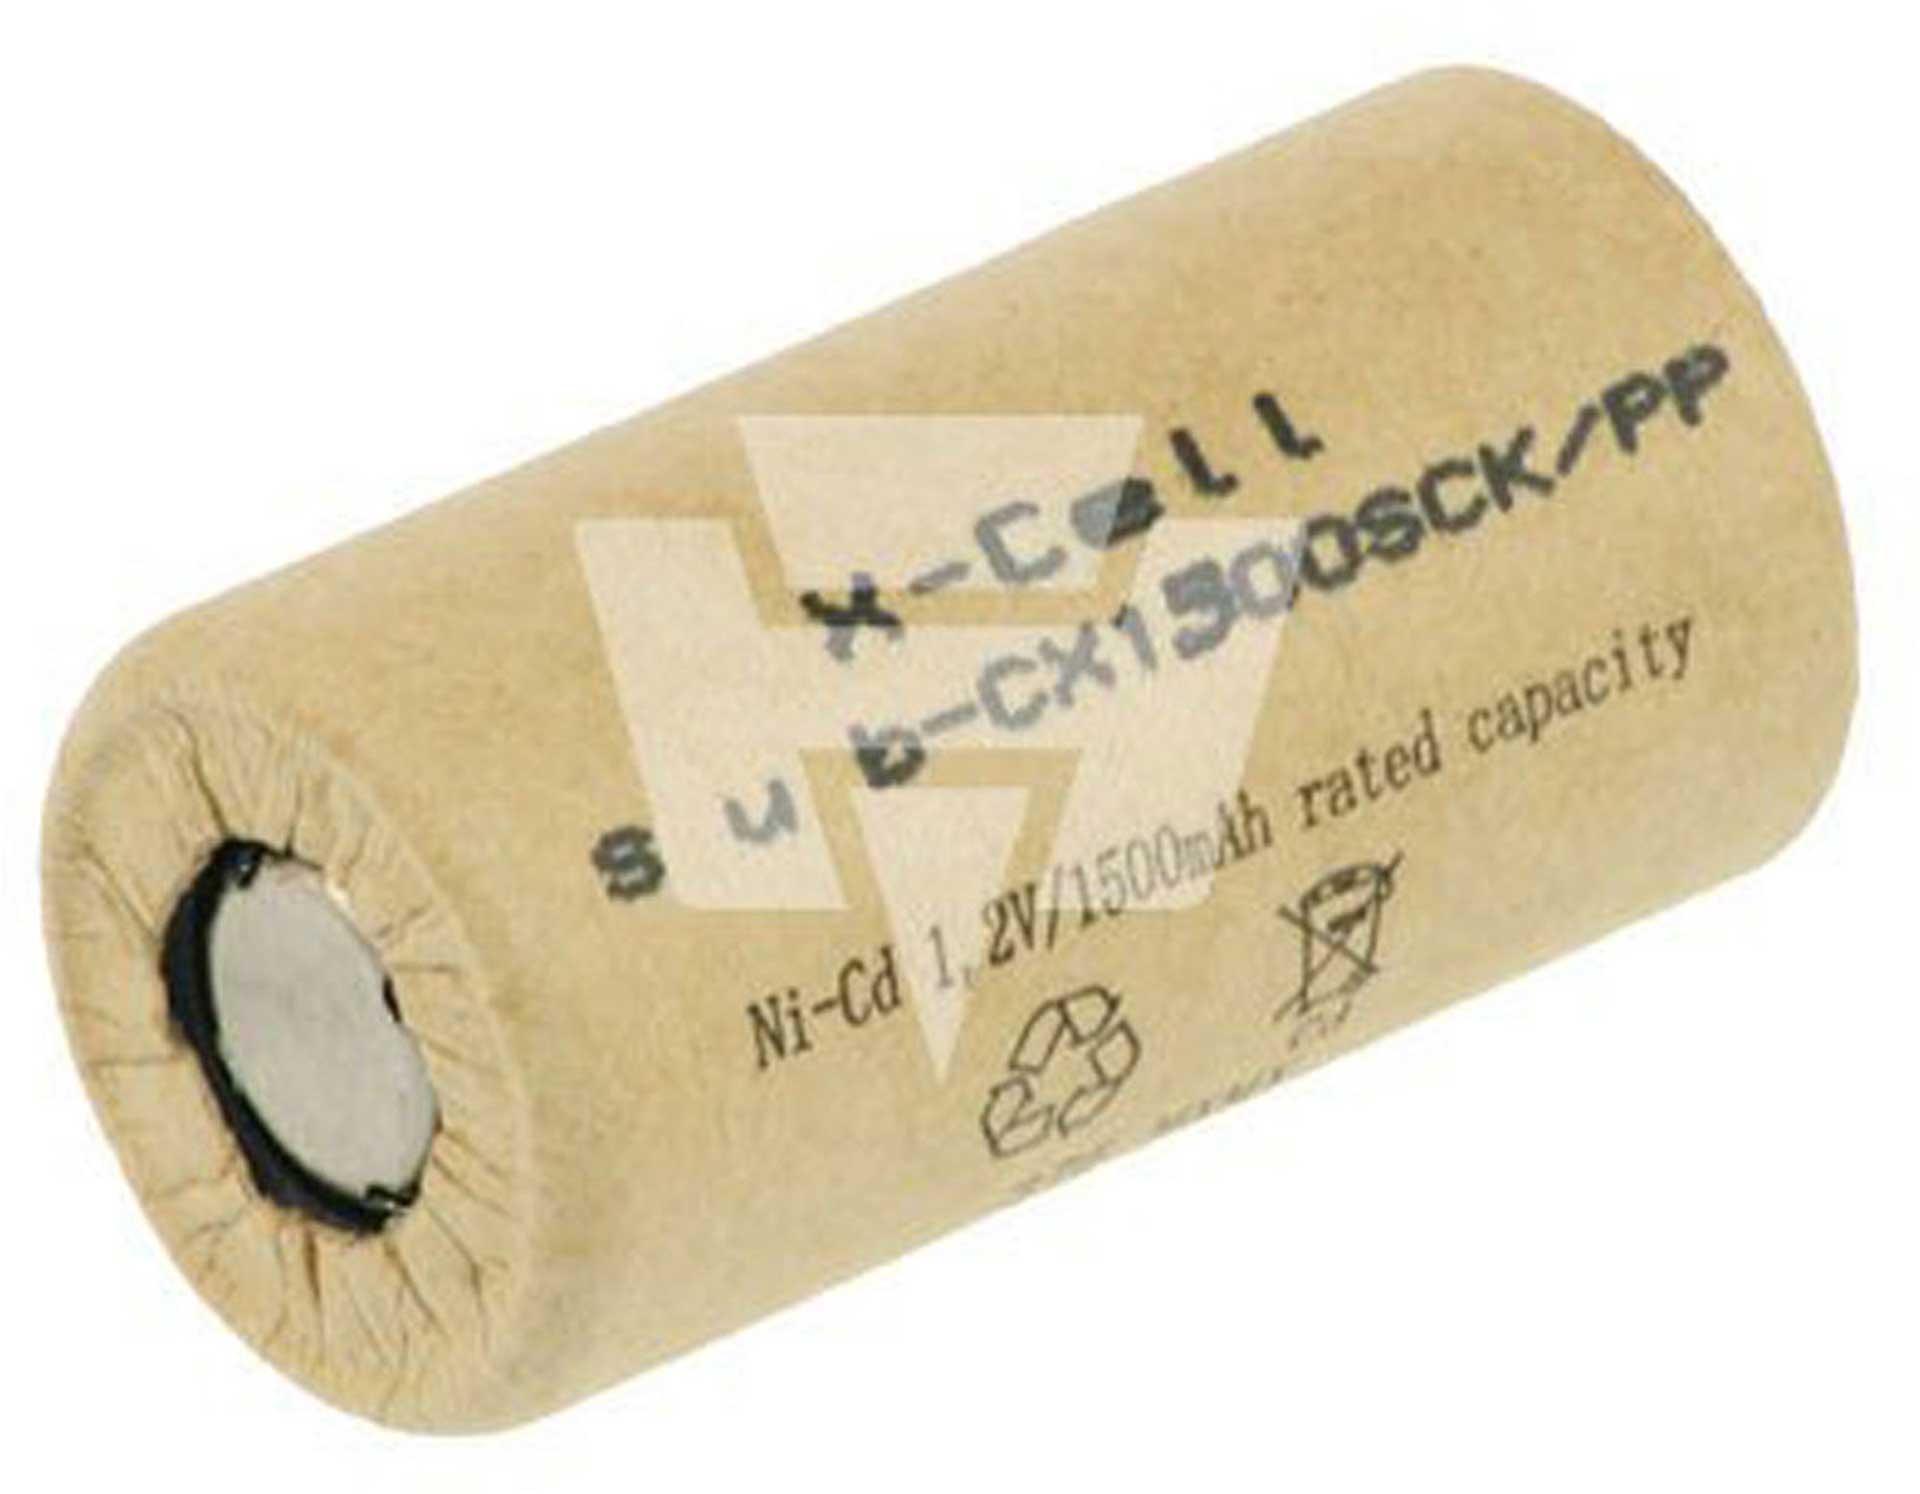 XCELL X1500SCK/PP NICD 1500MAH SUB-C